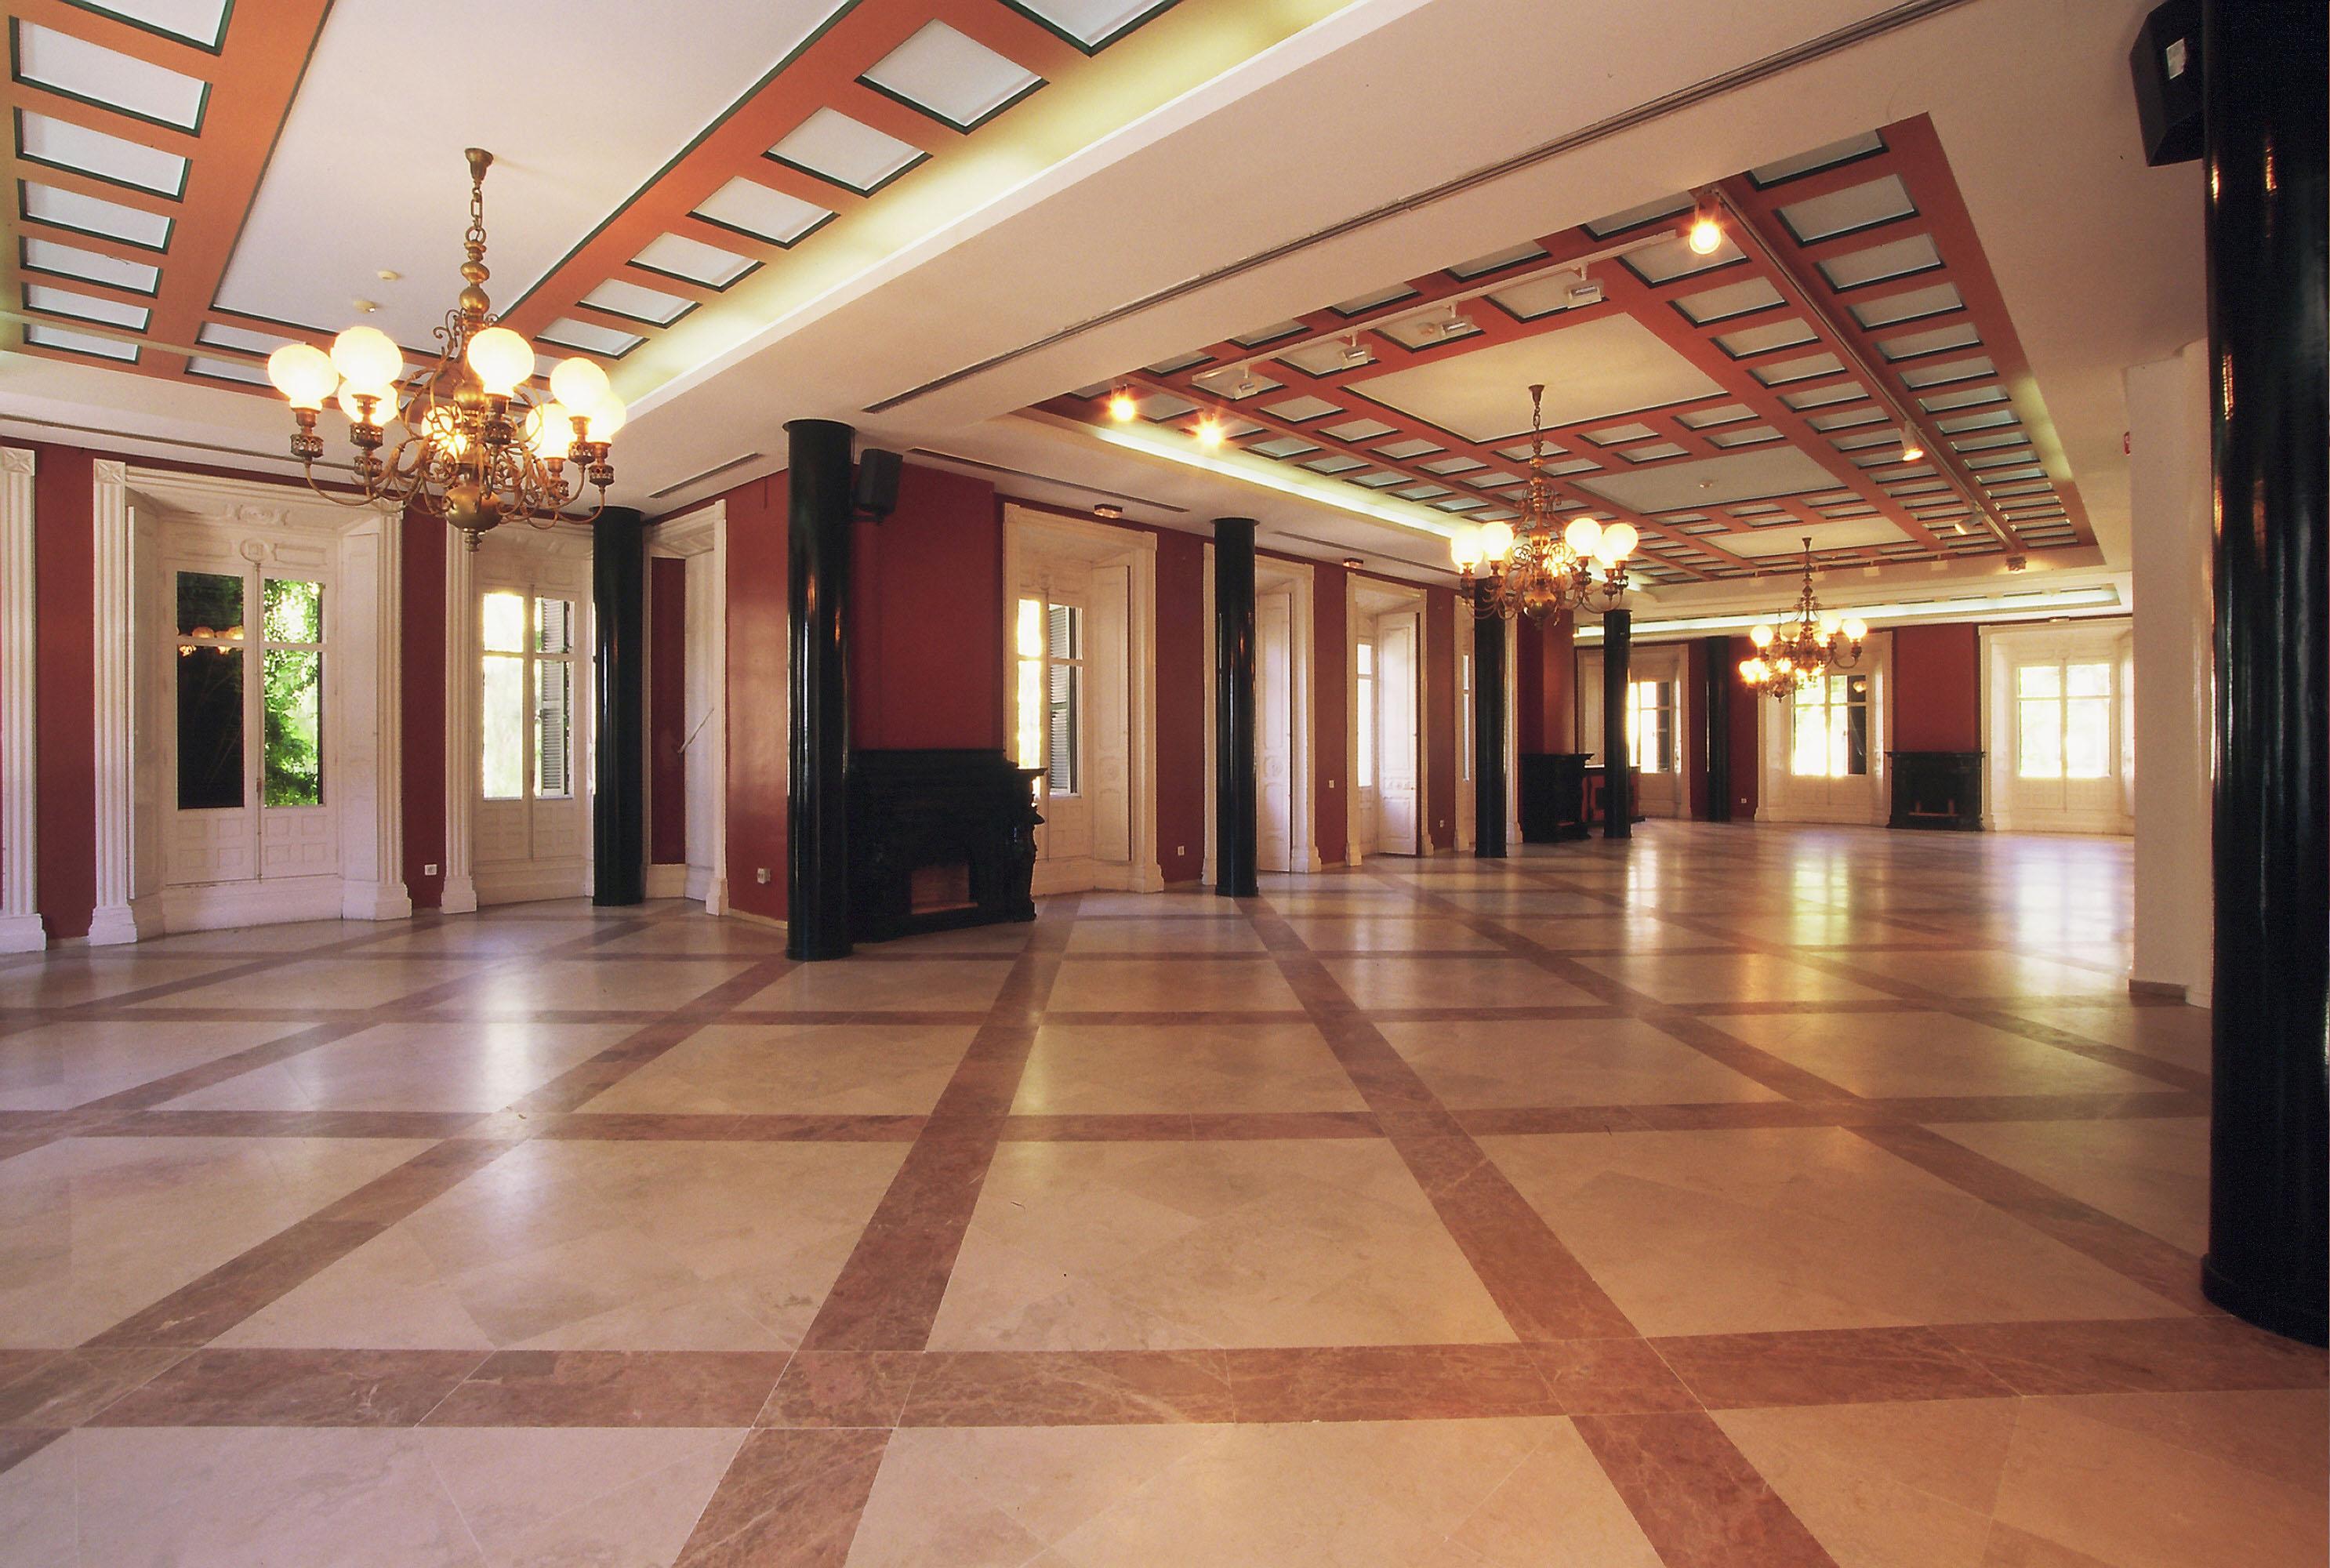 Junta de andaluc a palacio de congresos casa col n huelva - Casa colon huelva ...